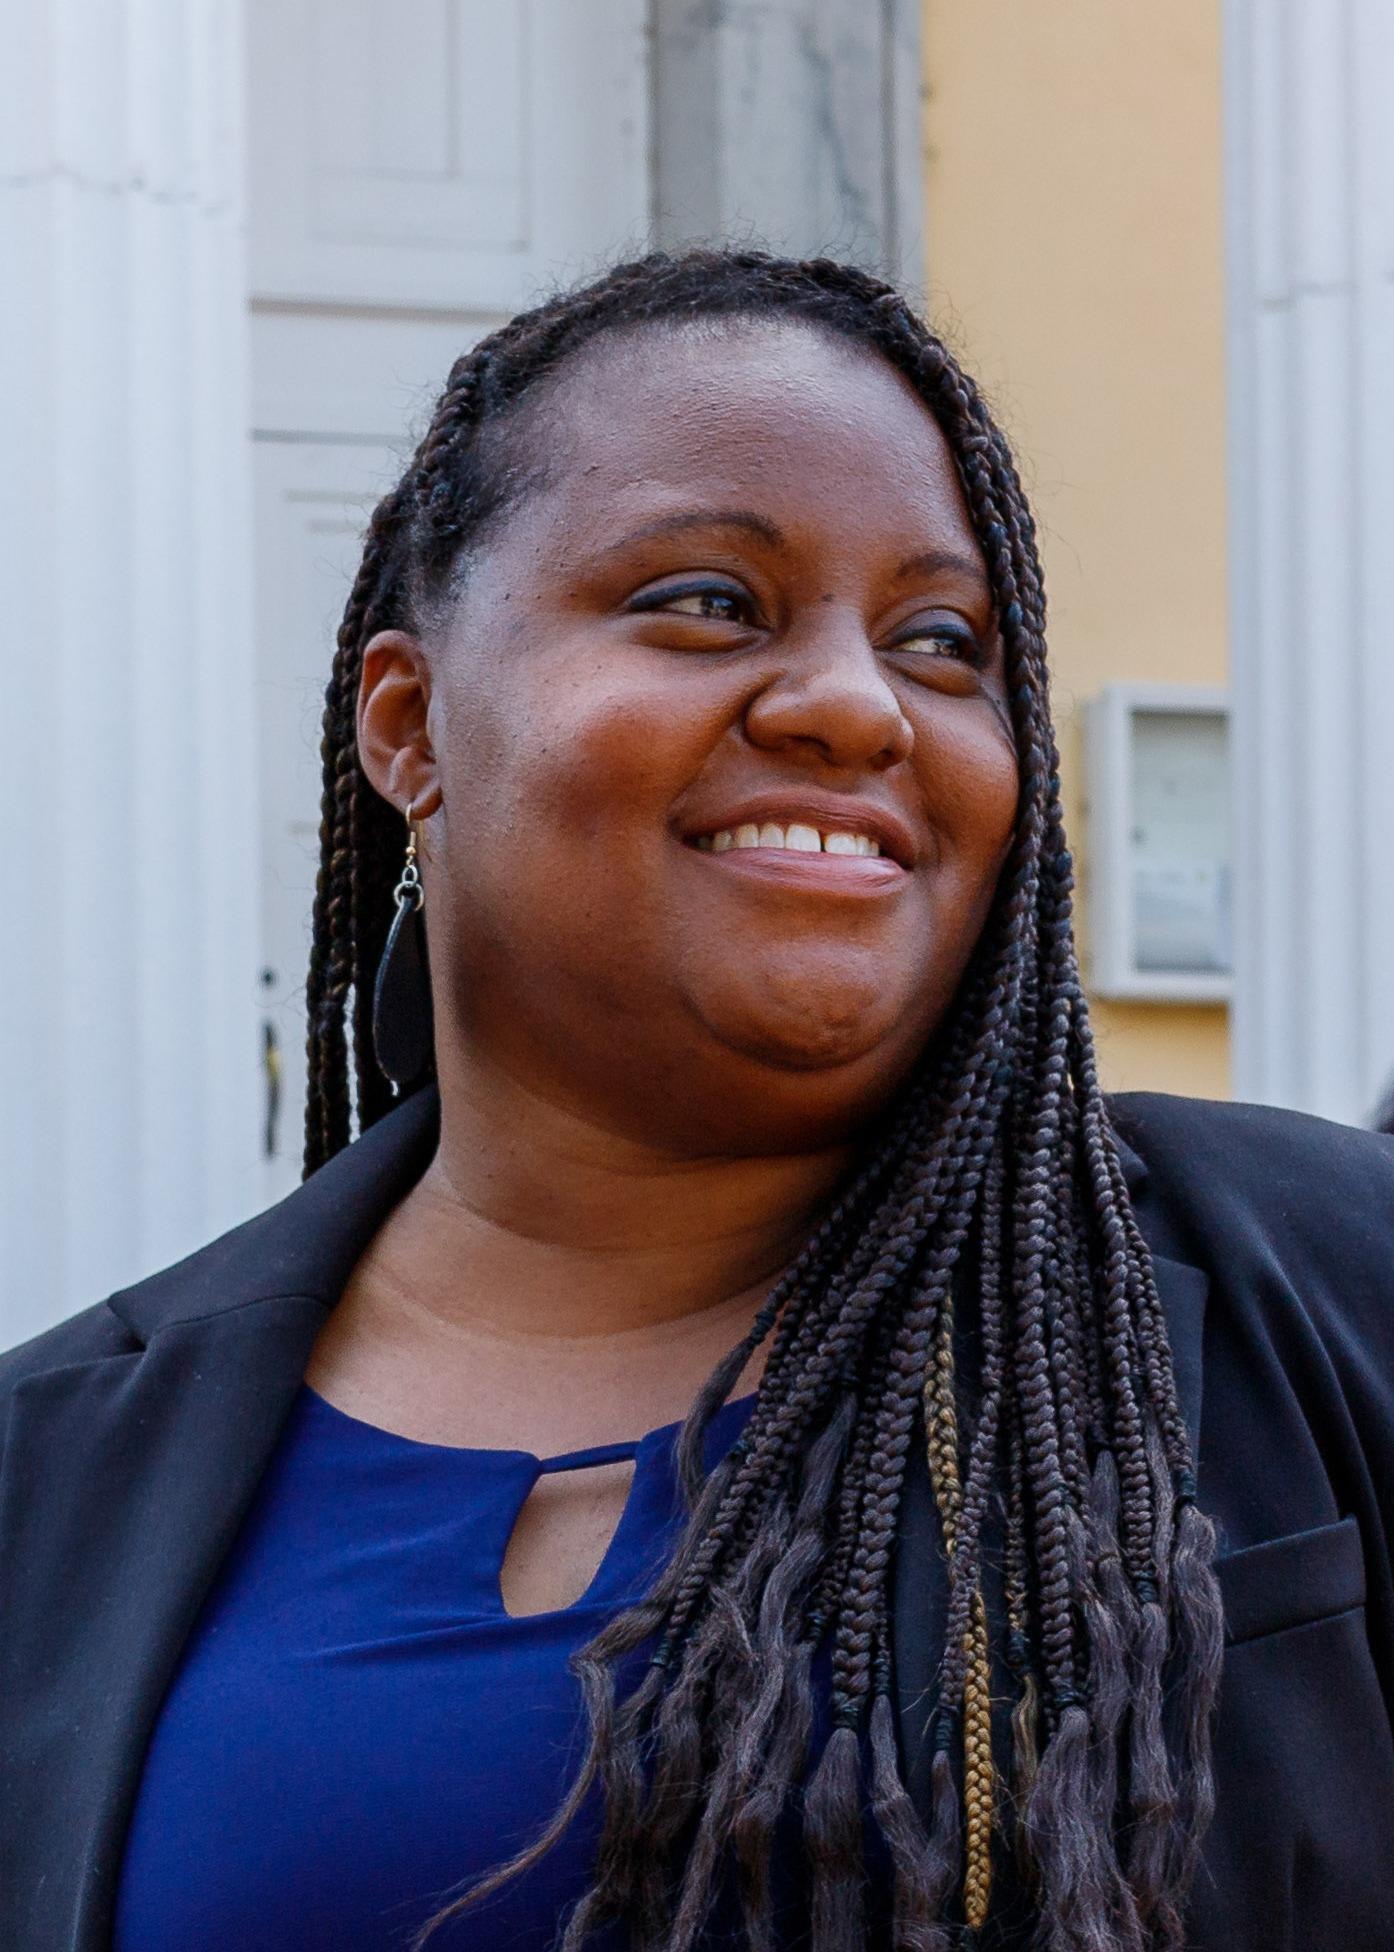 Erica Holmes, Director of Program Operations at St. Joseph's Villa